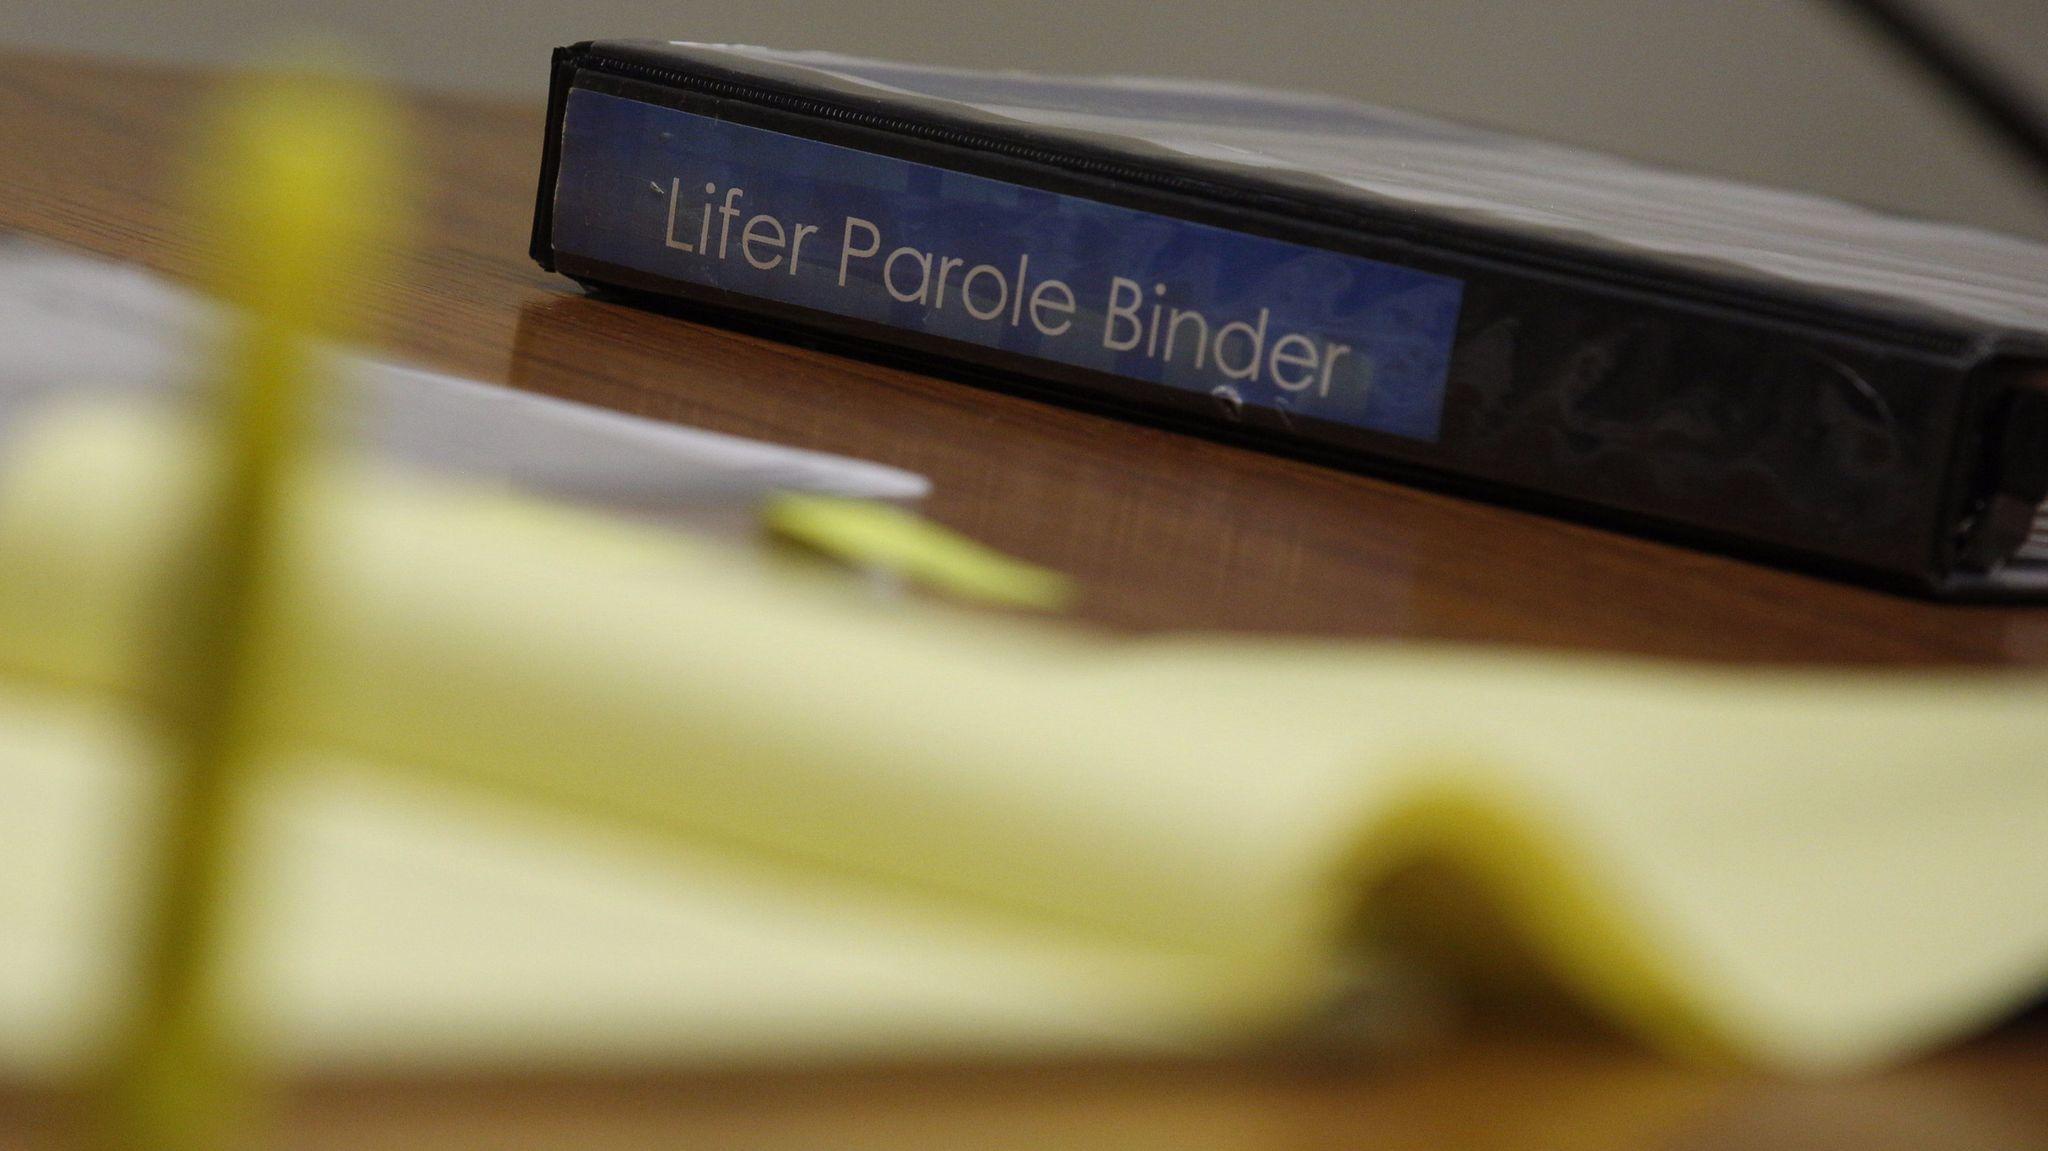 A lifer parole binder.